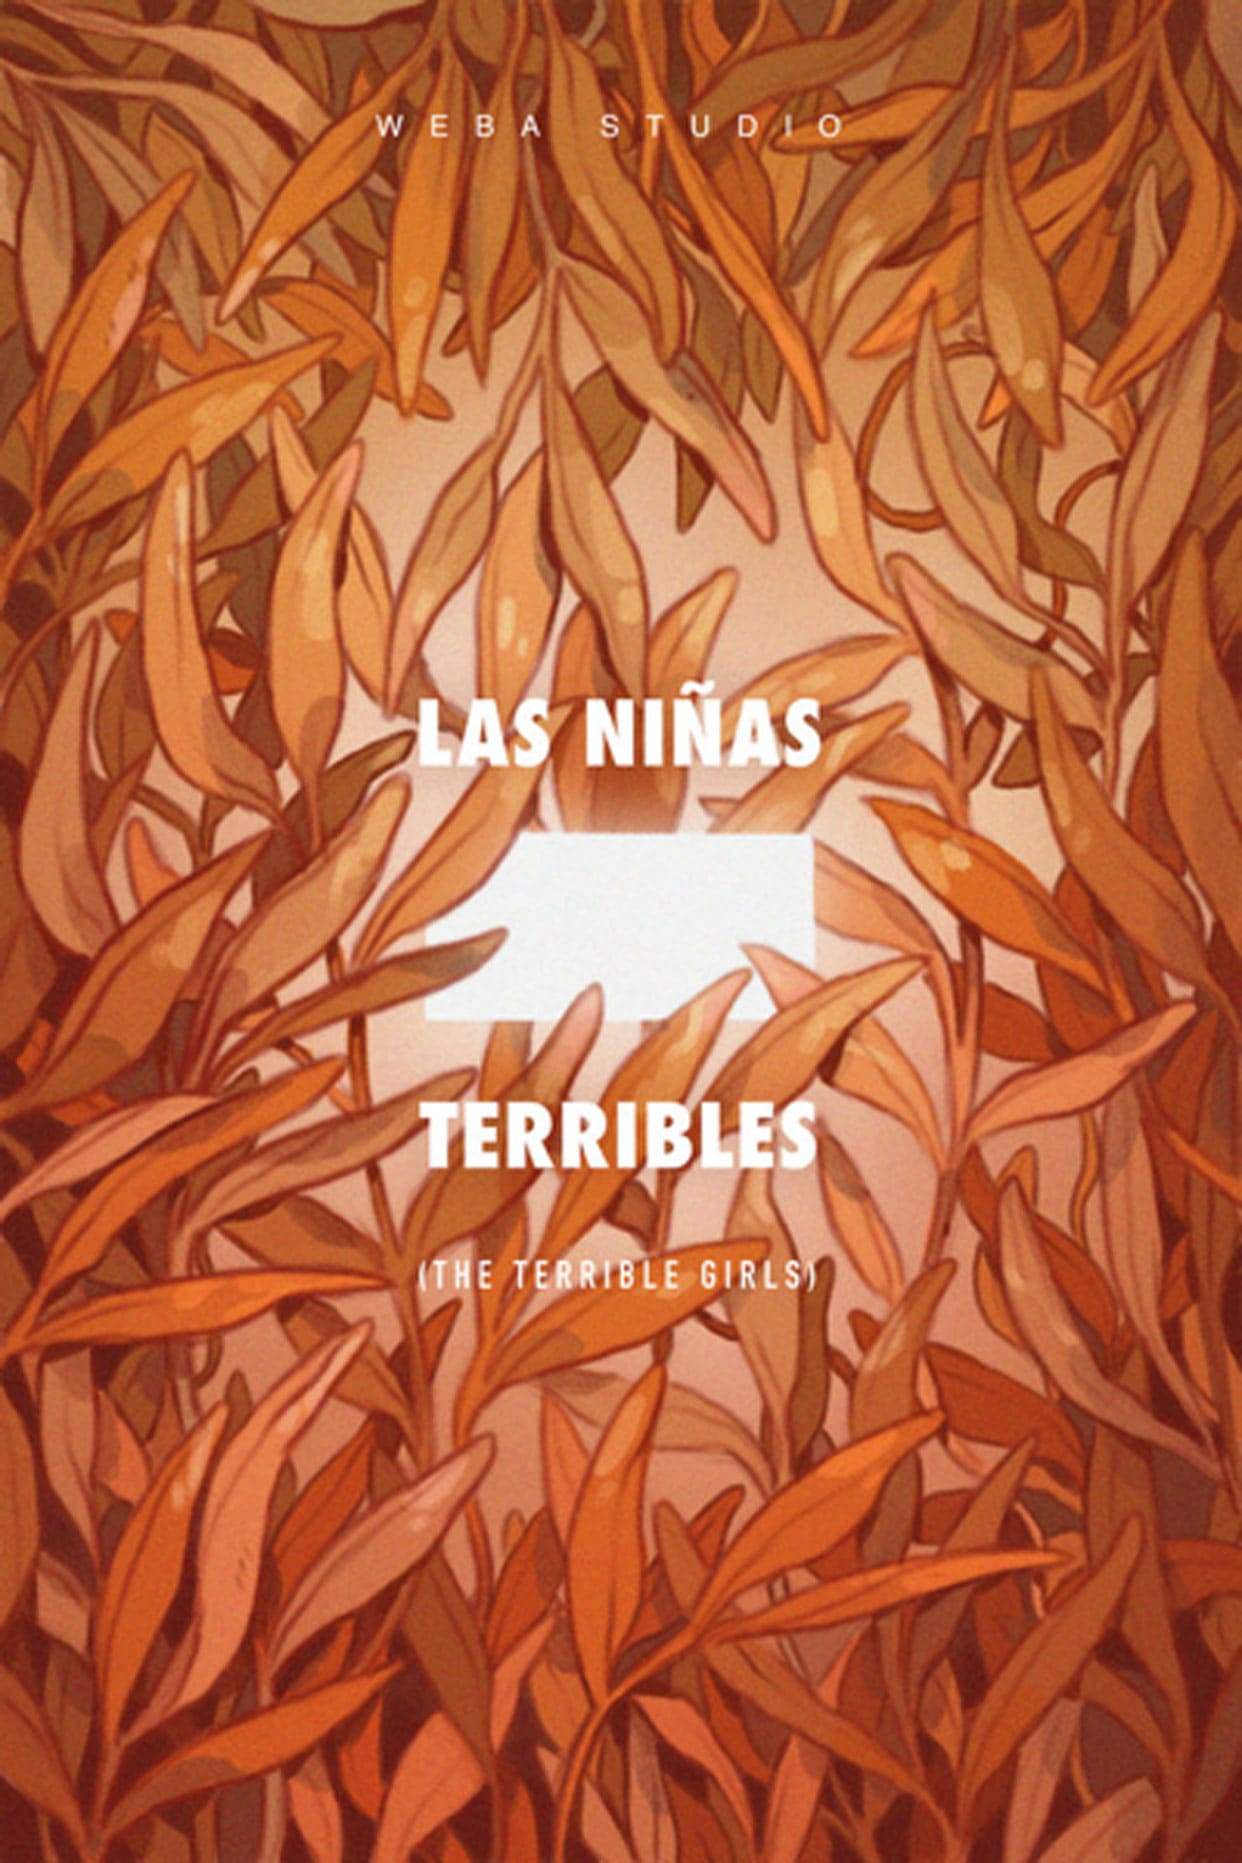 LAS-NIÑAS-TERRIBLES-David-Orellana